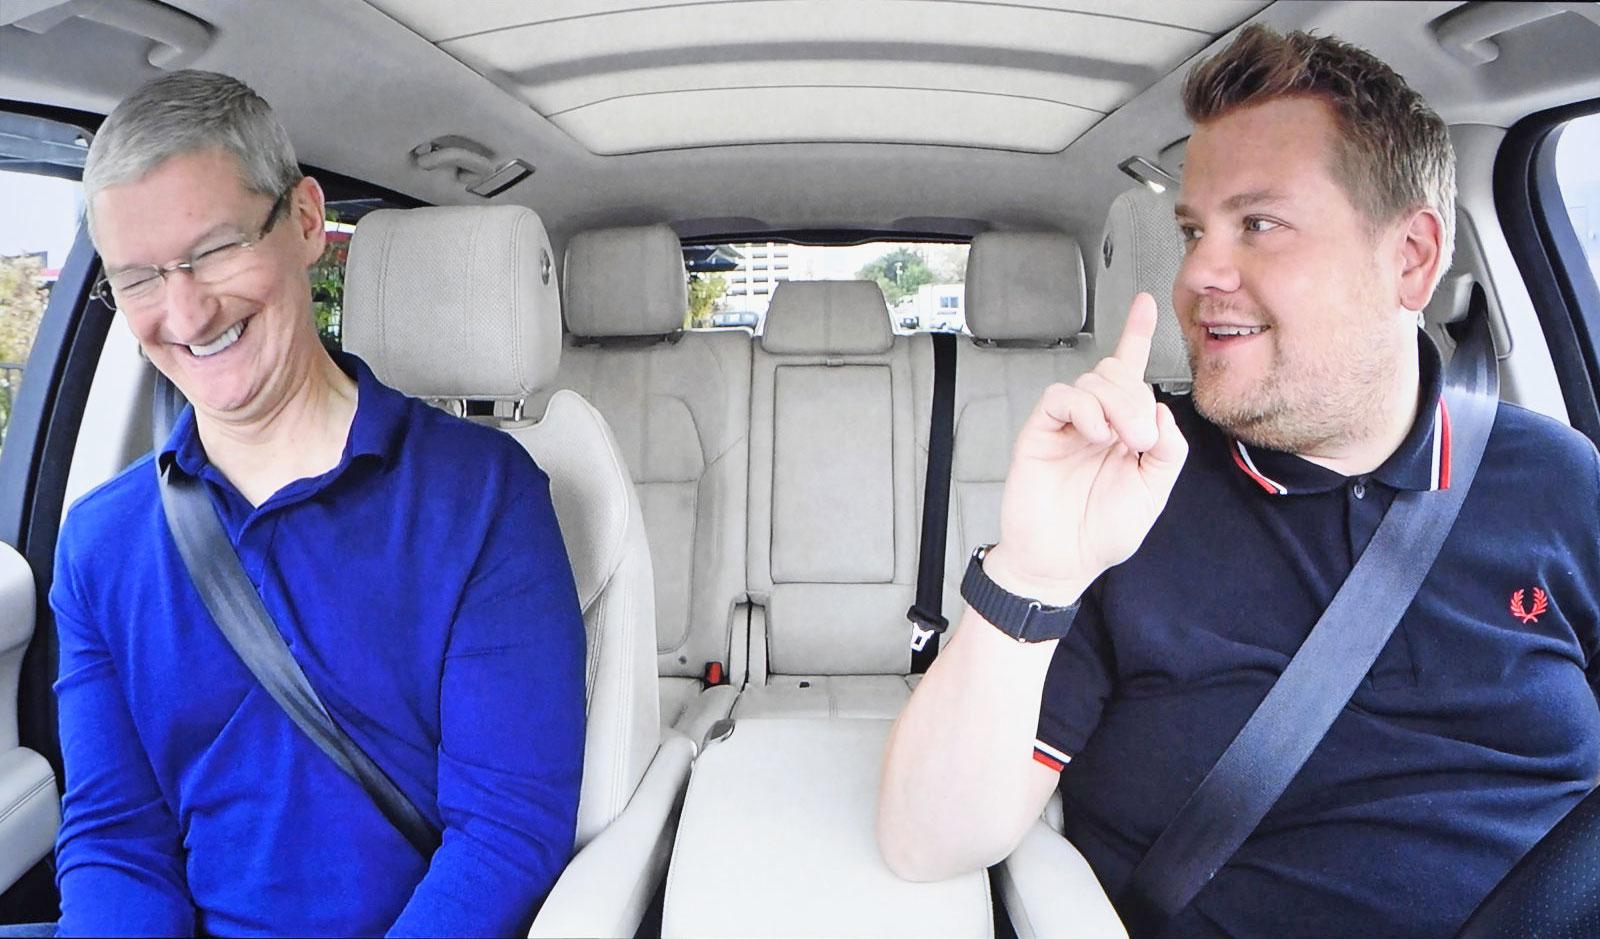 Apple will soon launch the second season of Carpool Karaoke